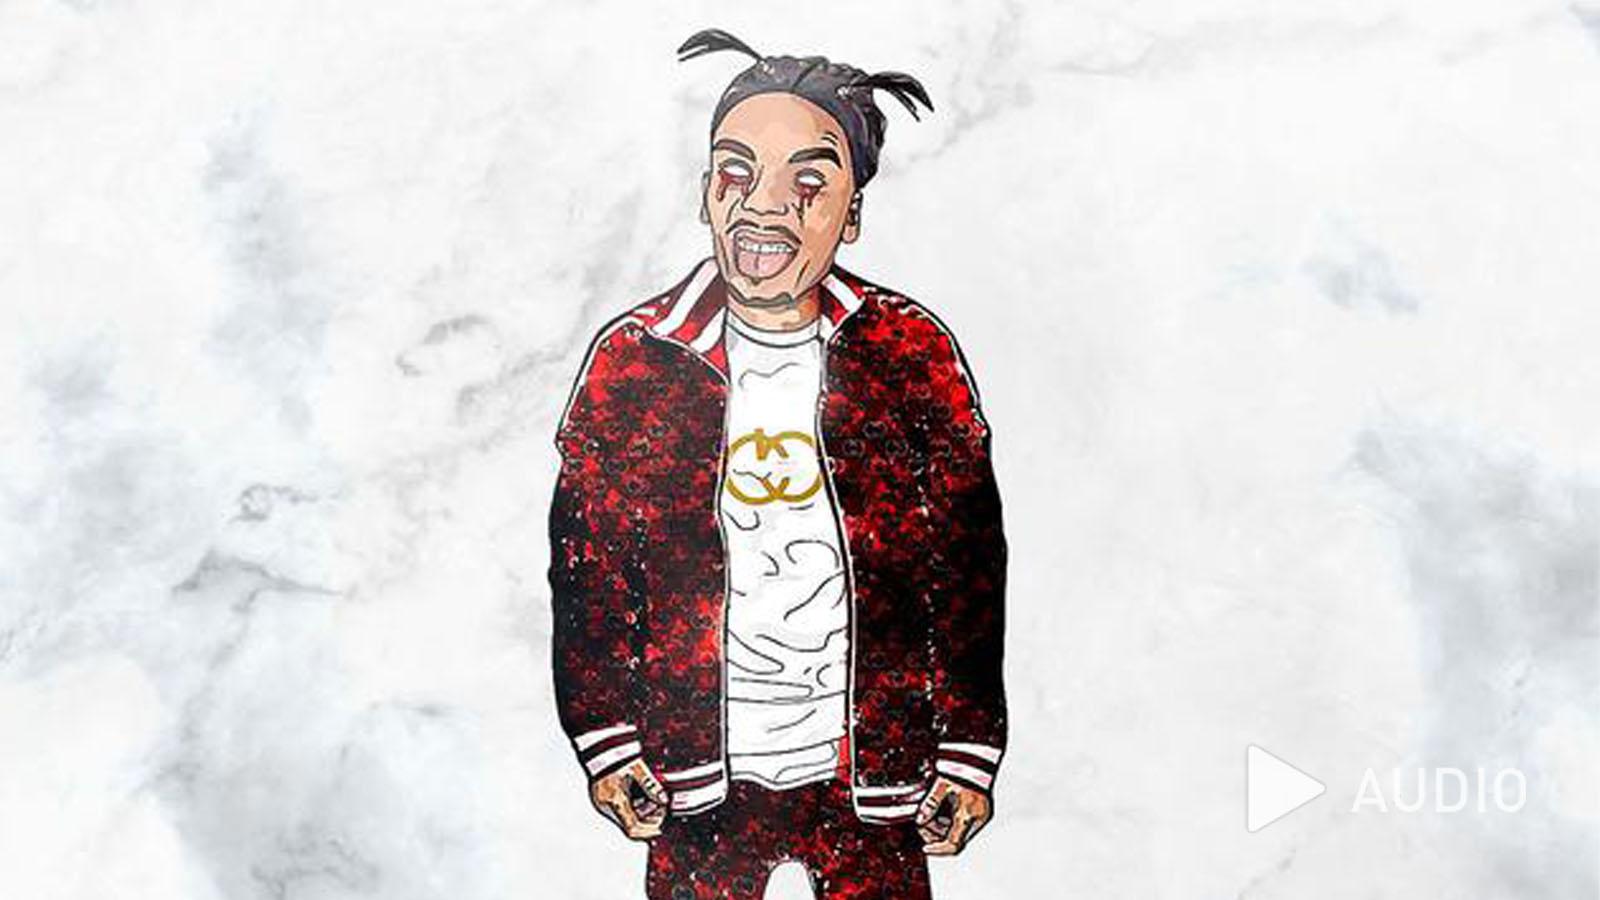 Joker Bra Dresscode Gucci Audio Hiphop De